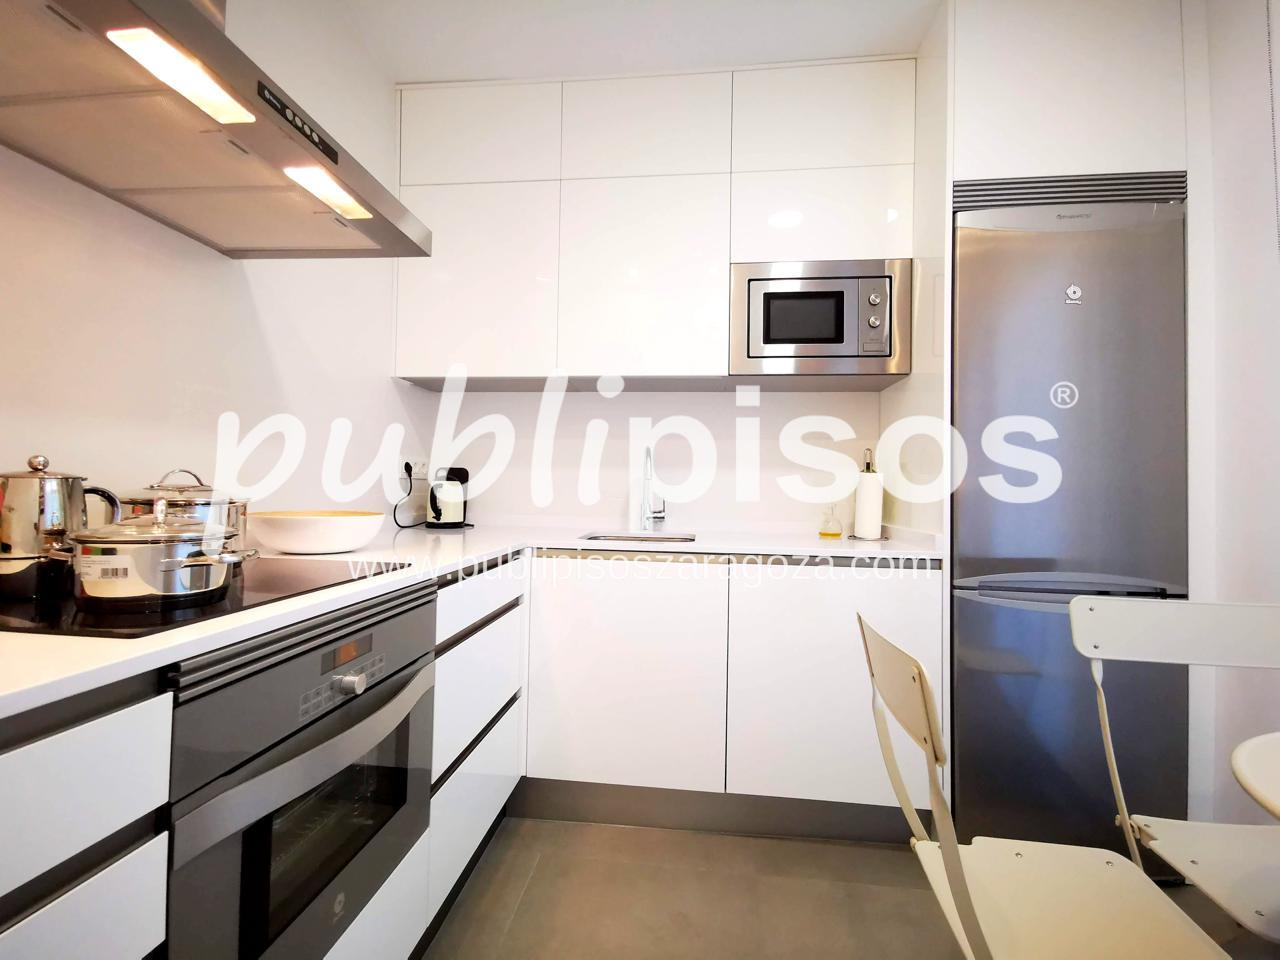 Piso obra nueva centro Zaragoza-10